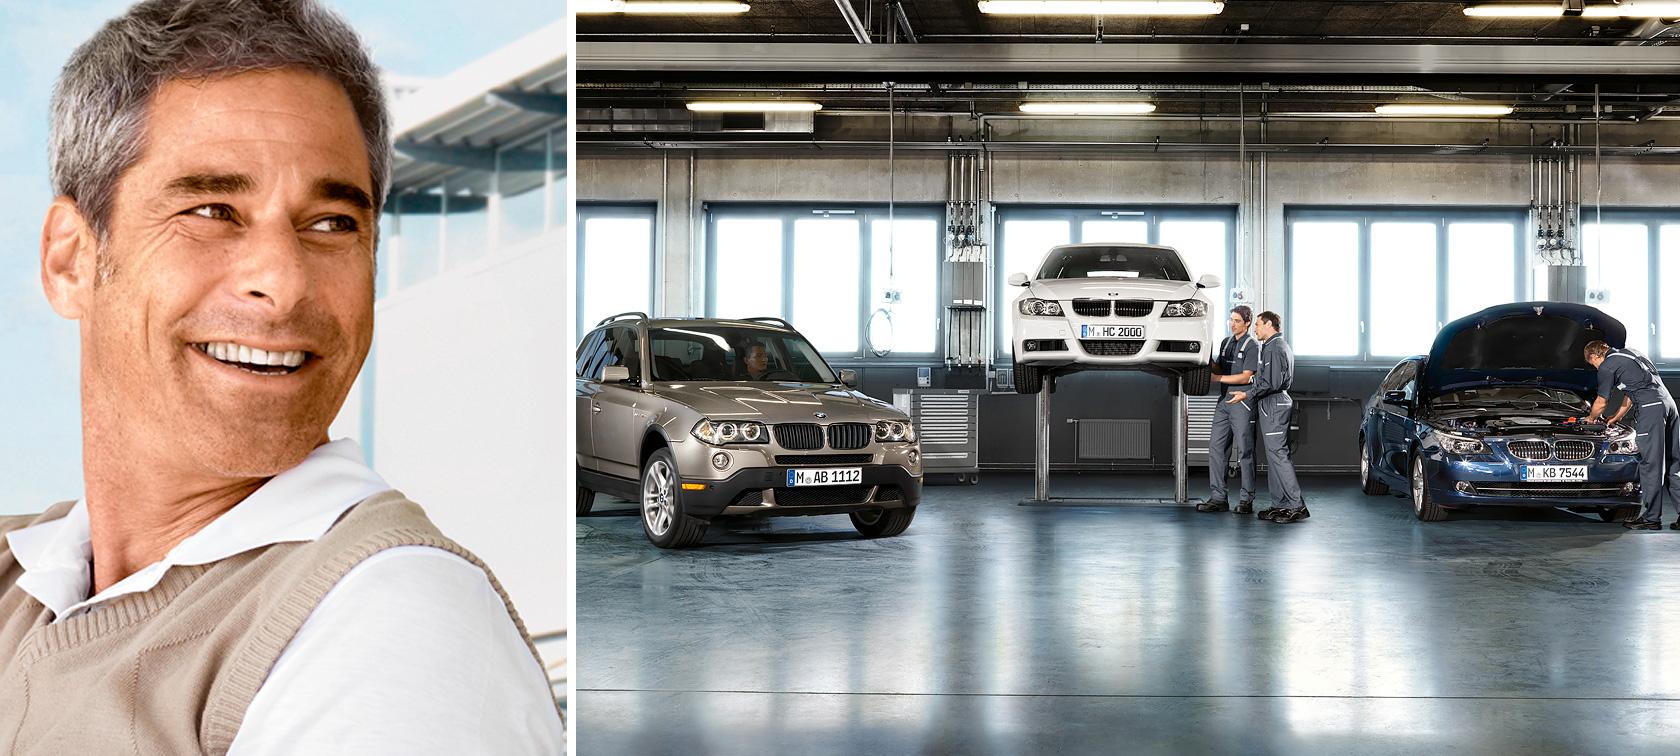 BMW Post-Motorplan   Car maintenance   BMW Services